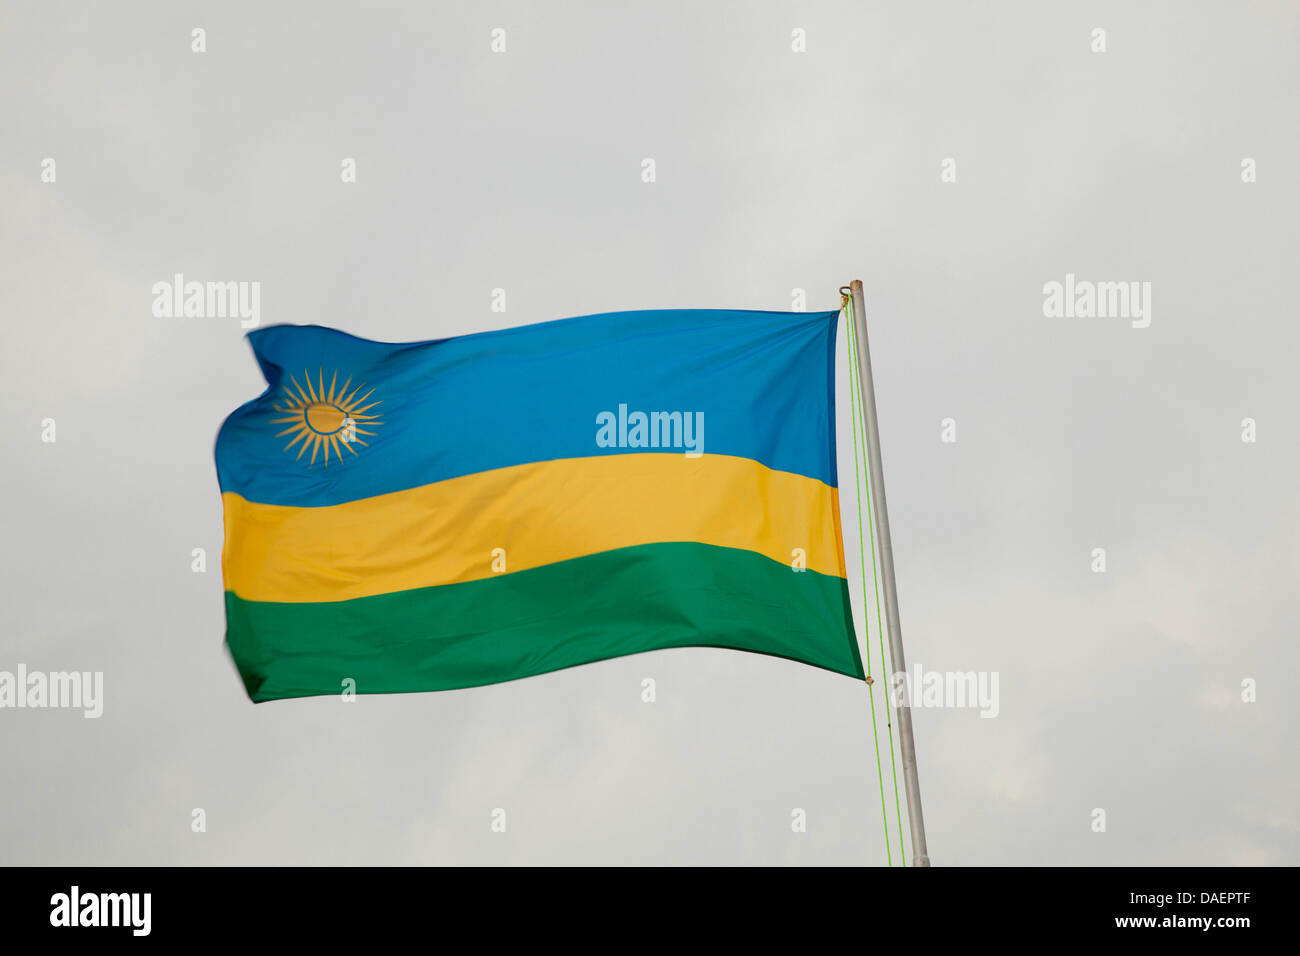 flag of Ruanda blowing in the wind, Rwanda Stock Photo